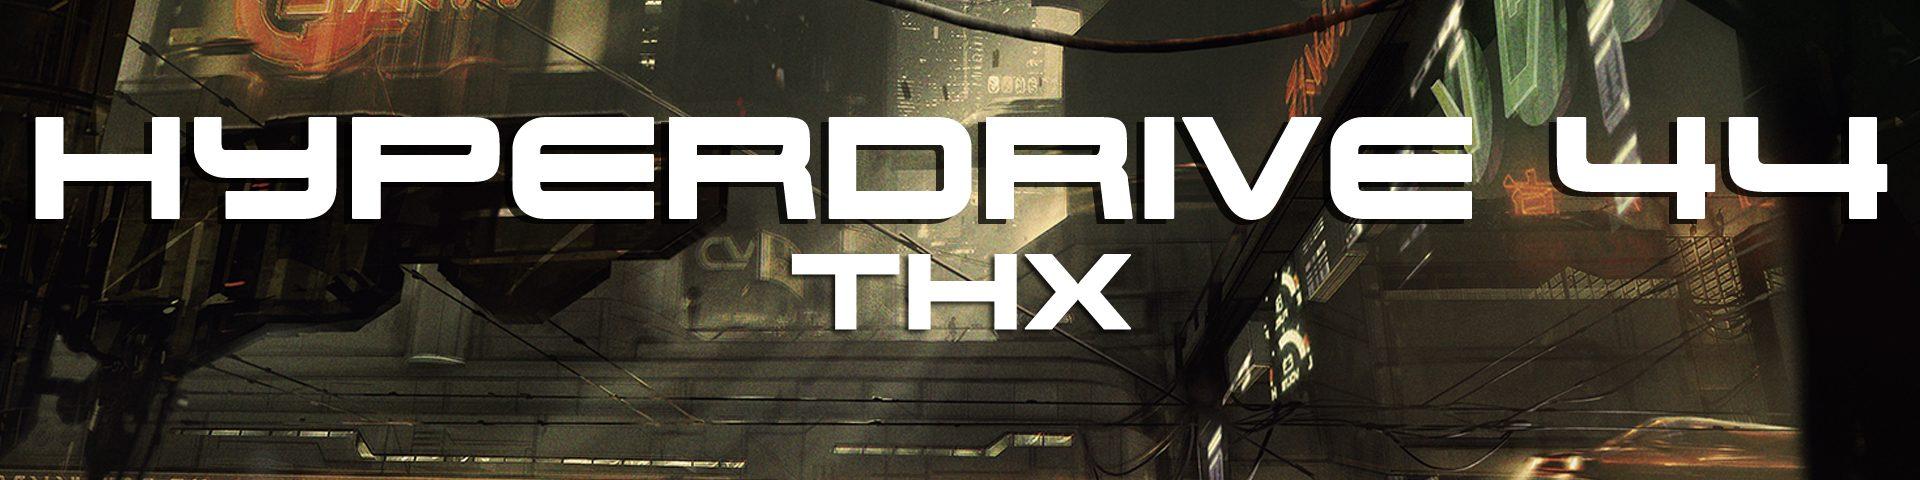 hyperdrive podcast star wars THX